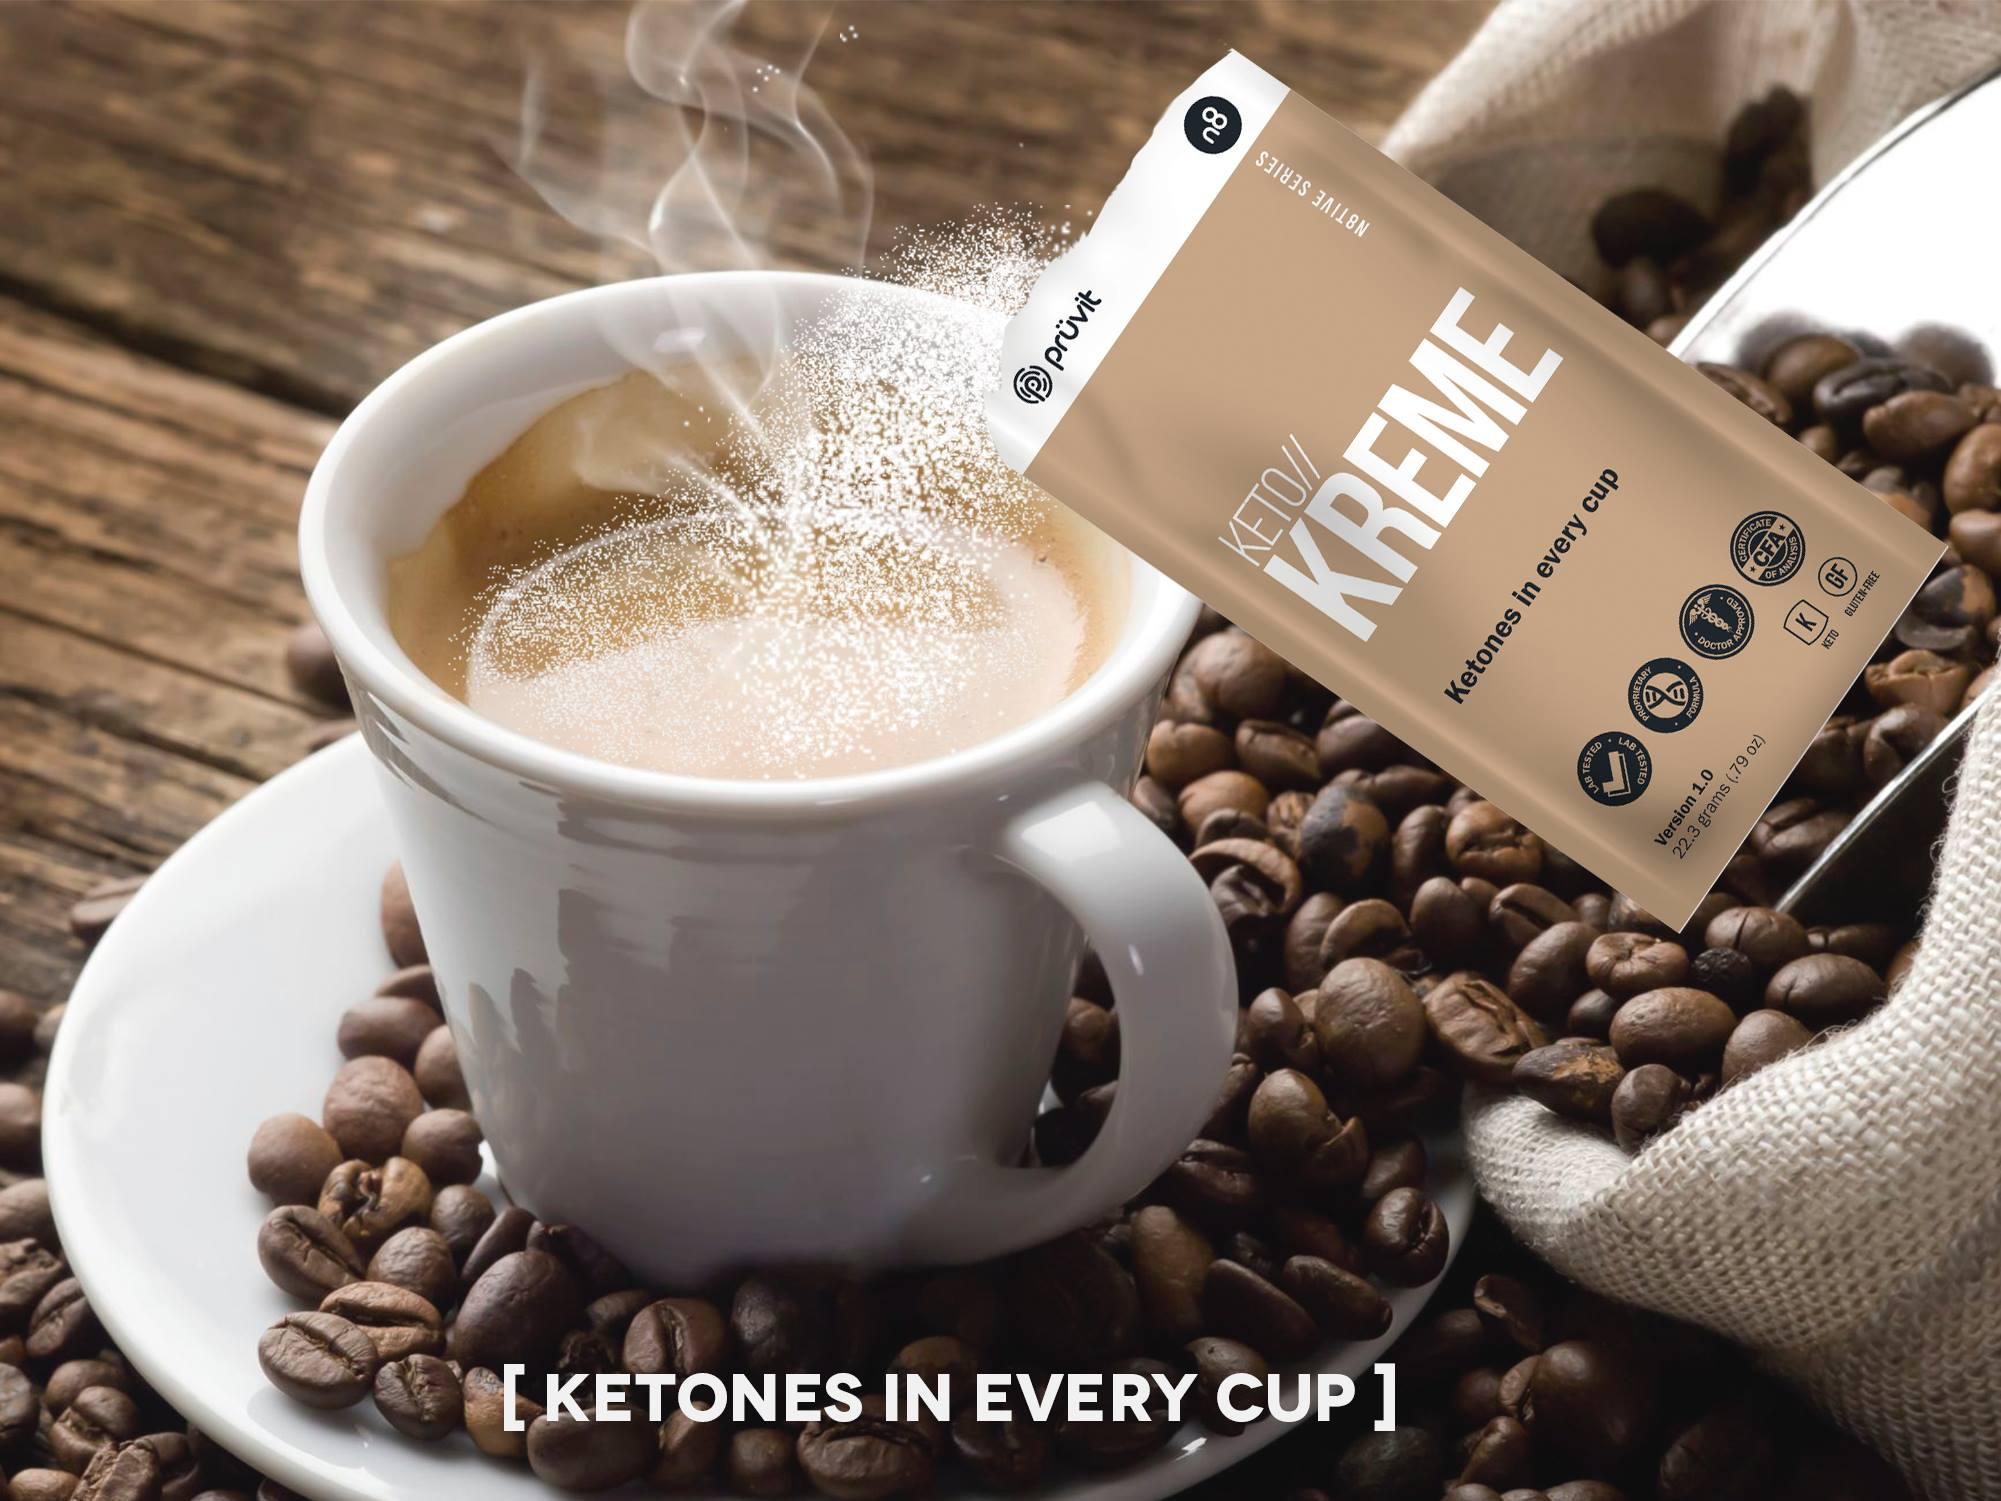 keto kreme by pruvit bullet proof coffee simplified